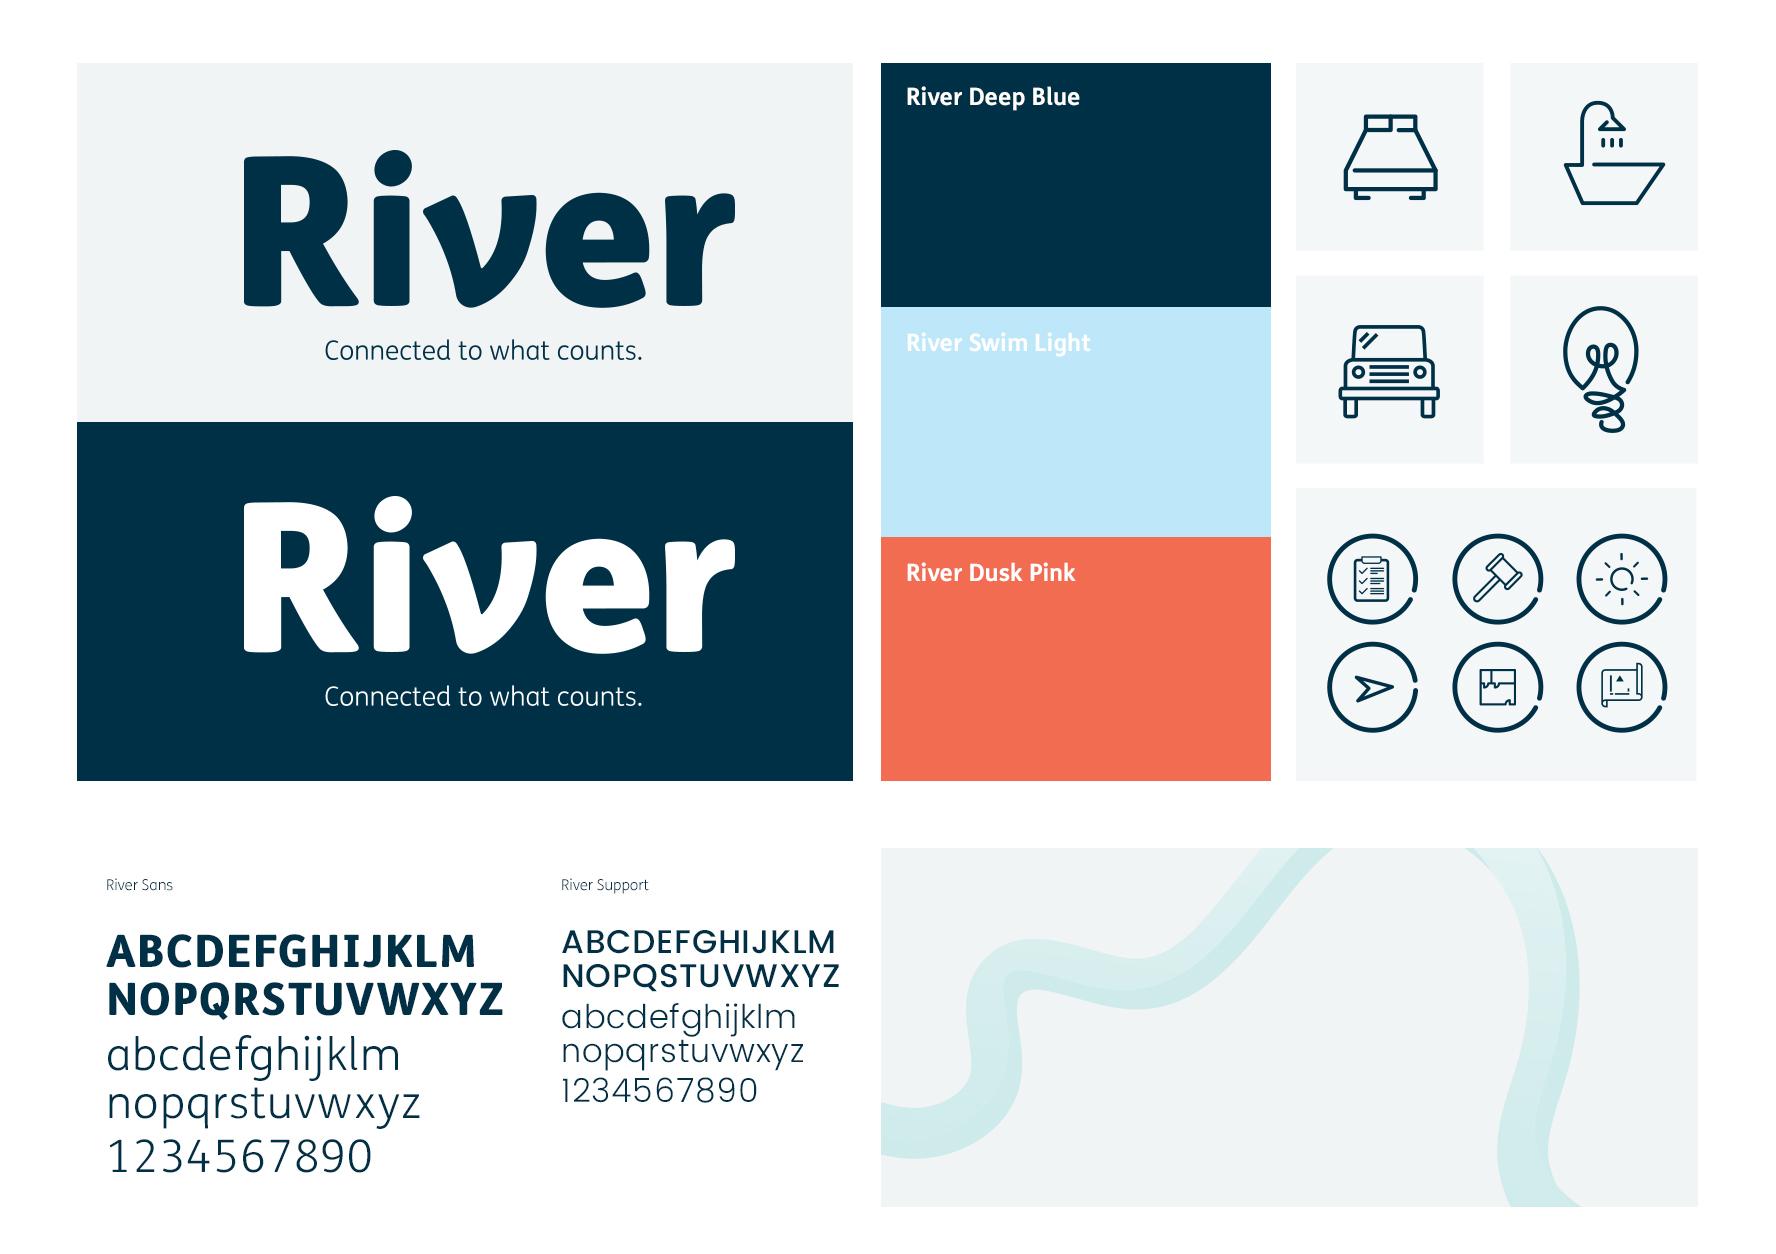 River_Realty_brand_identity_assets.jpg